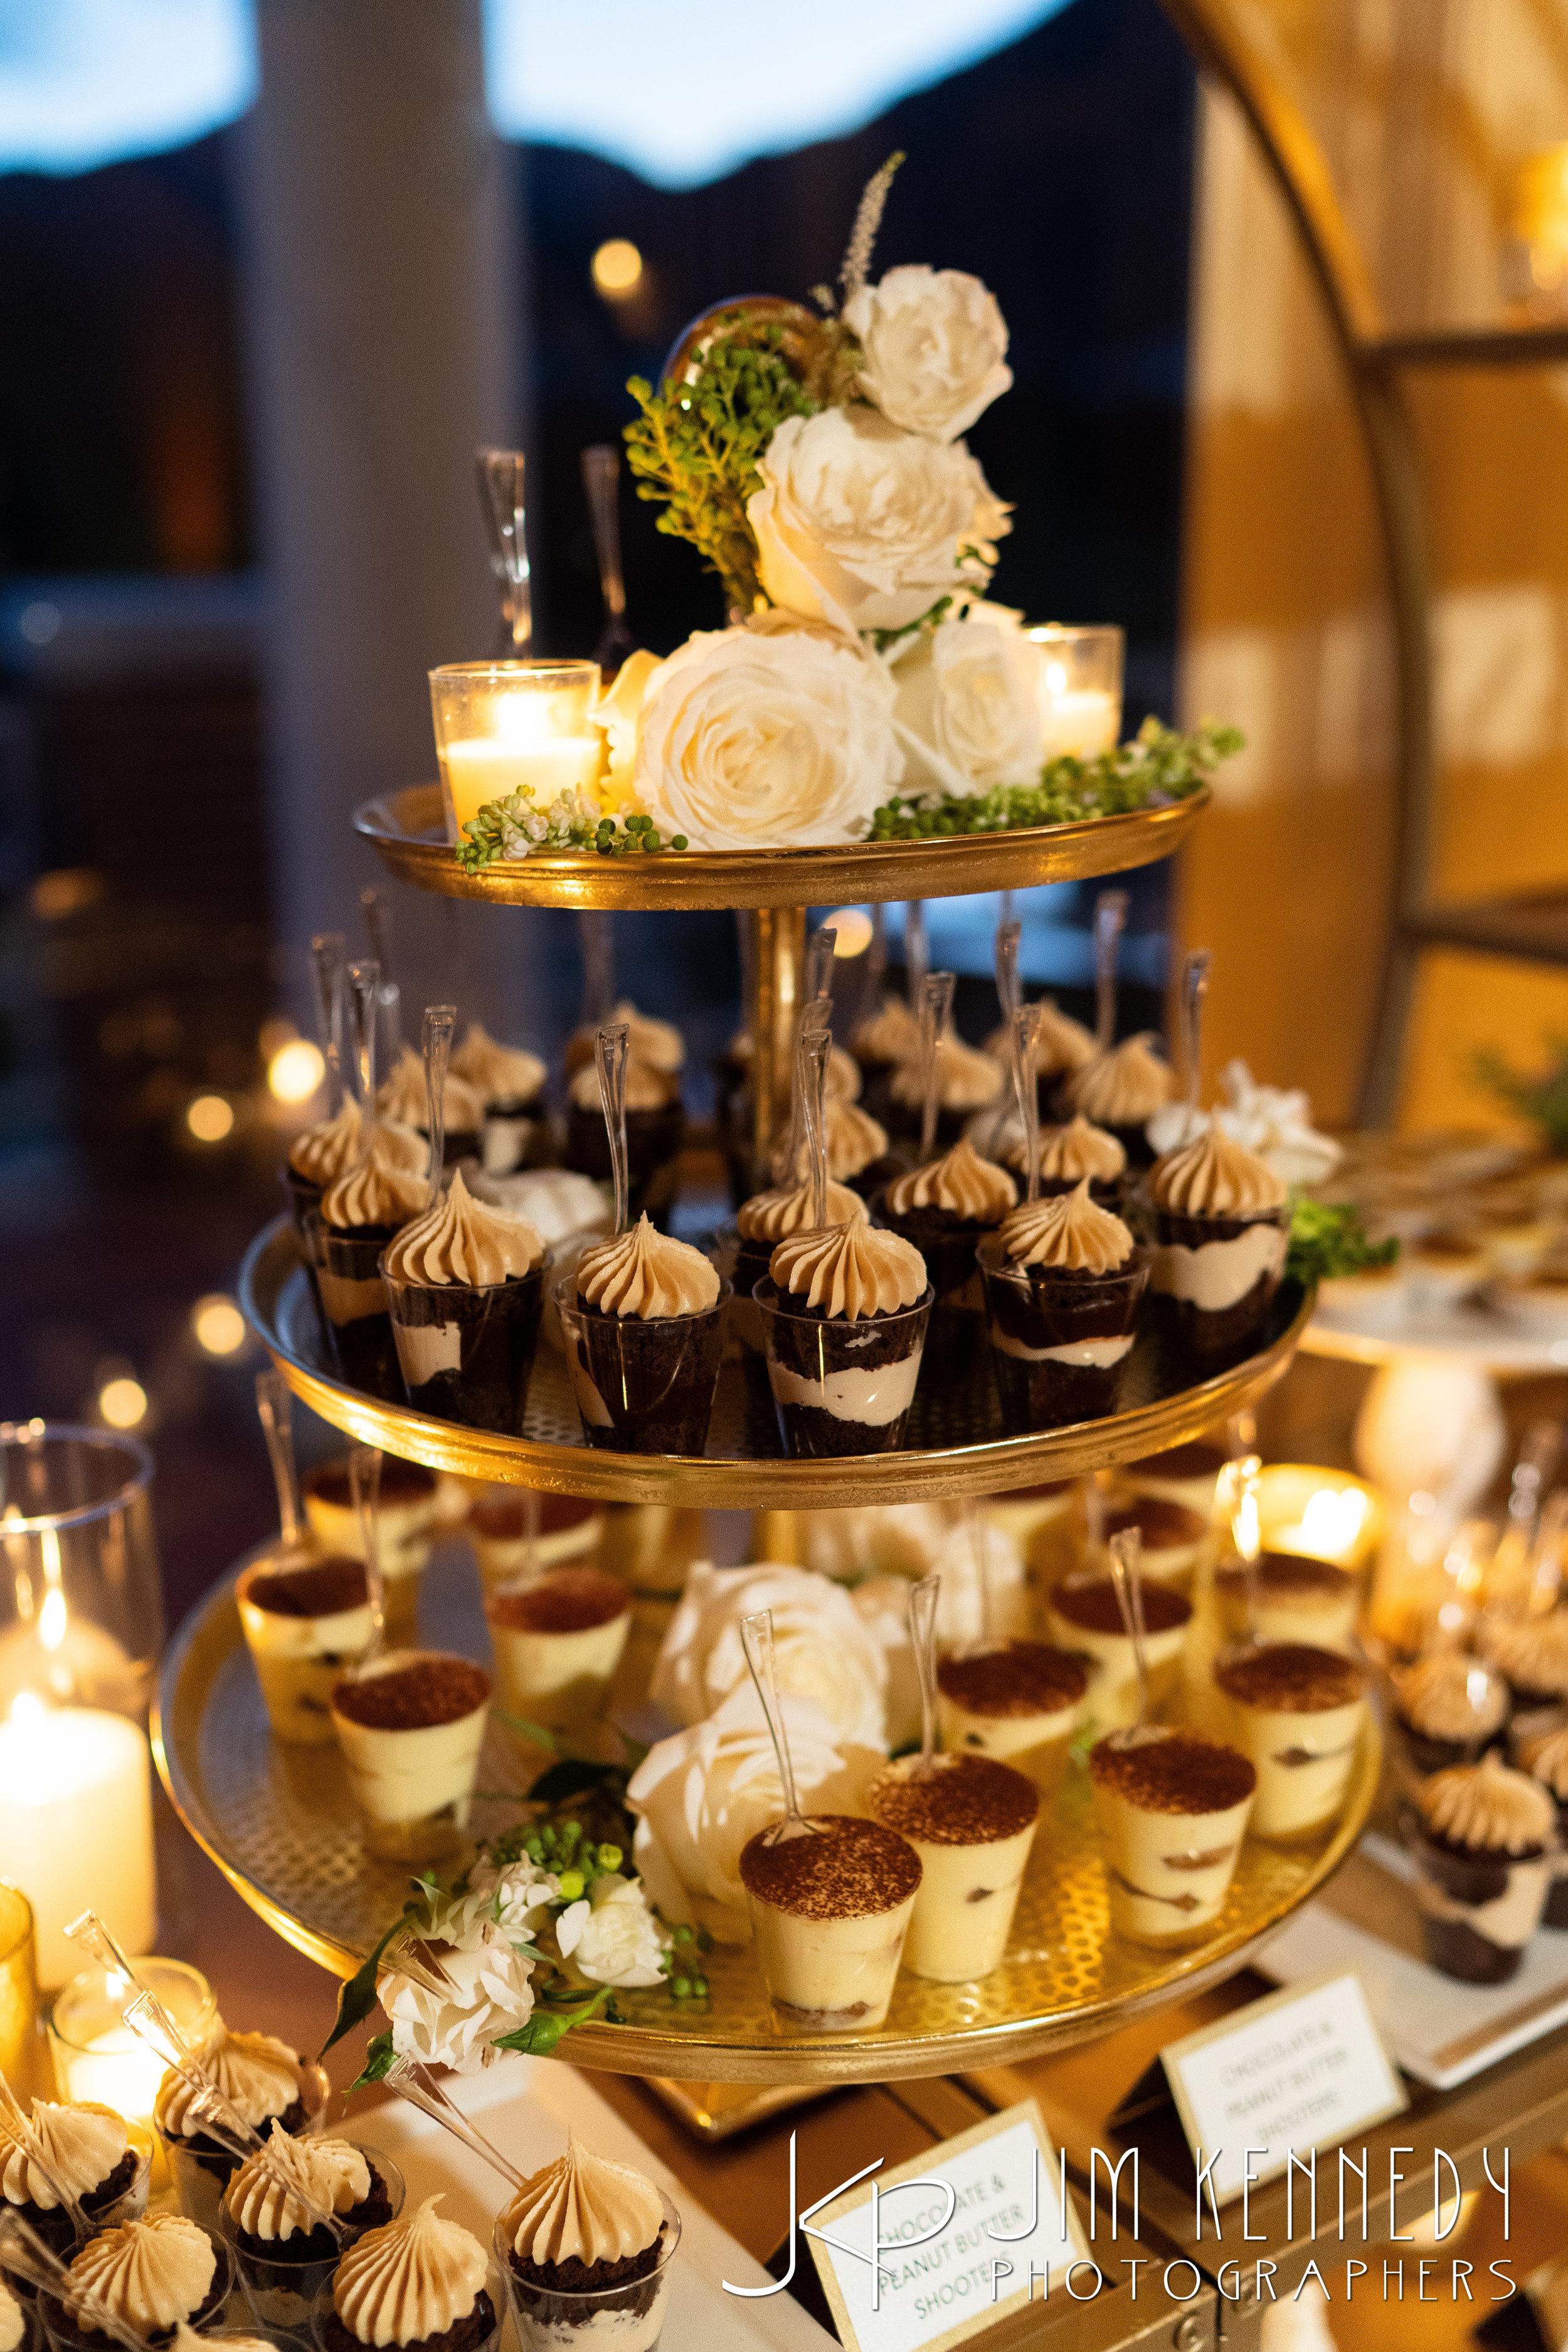 sherwood_country_club_wedding-2951.jpg